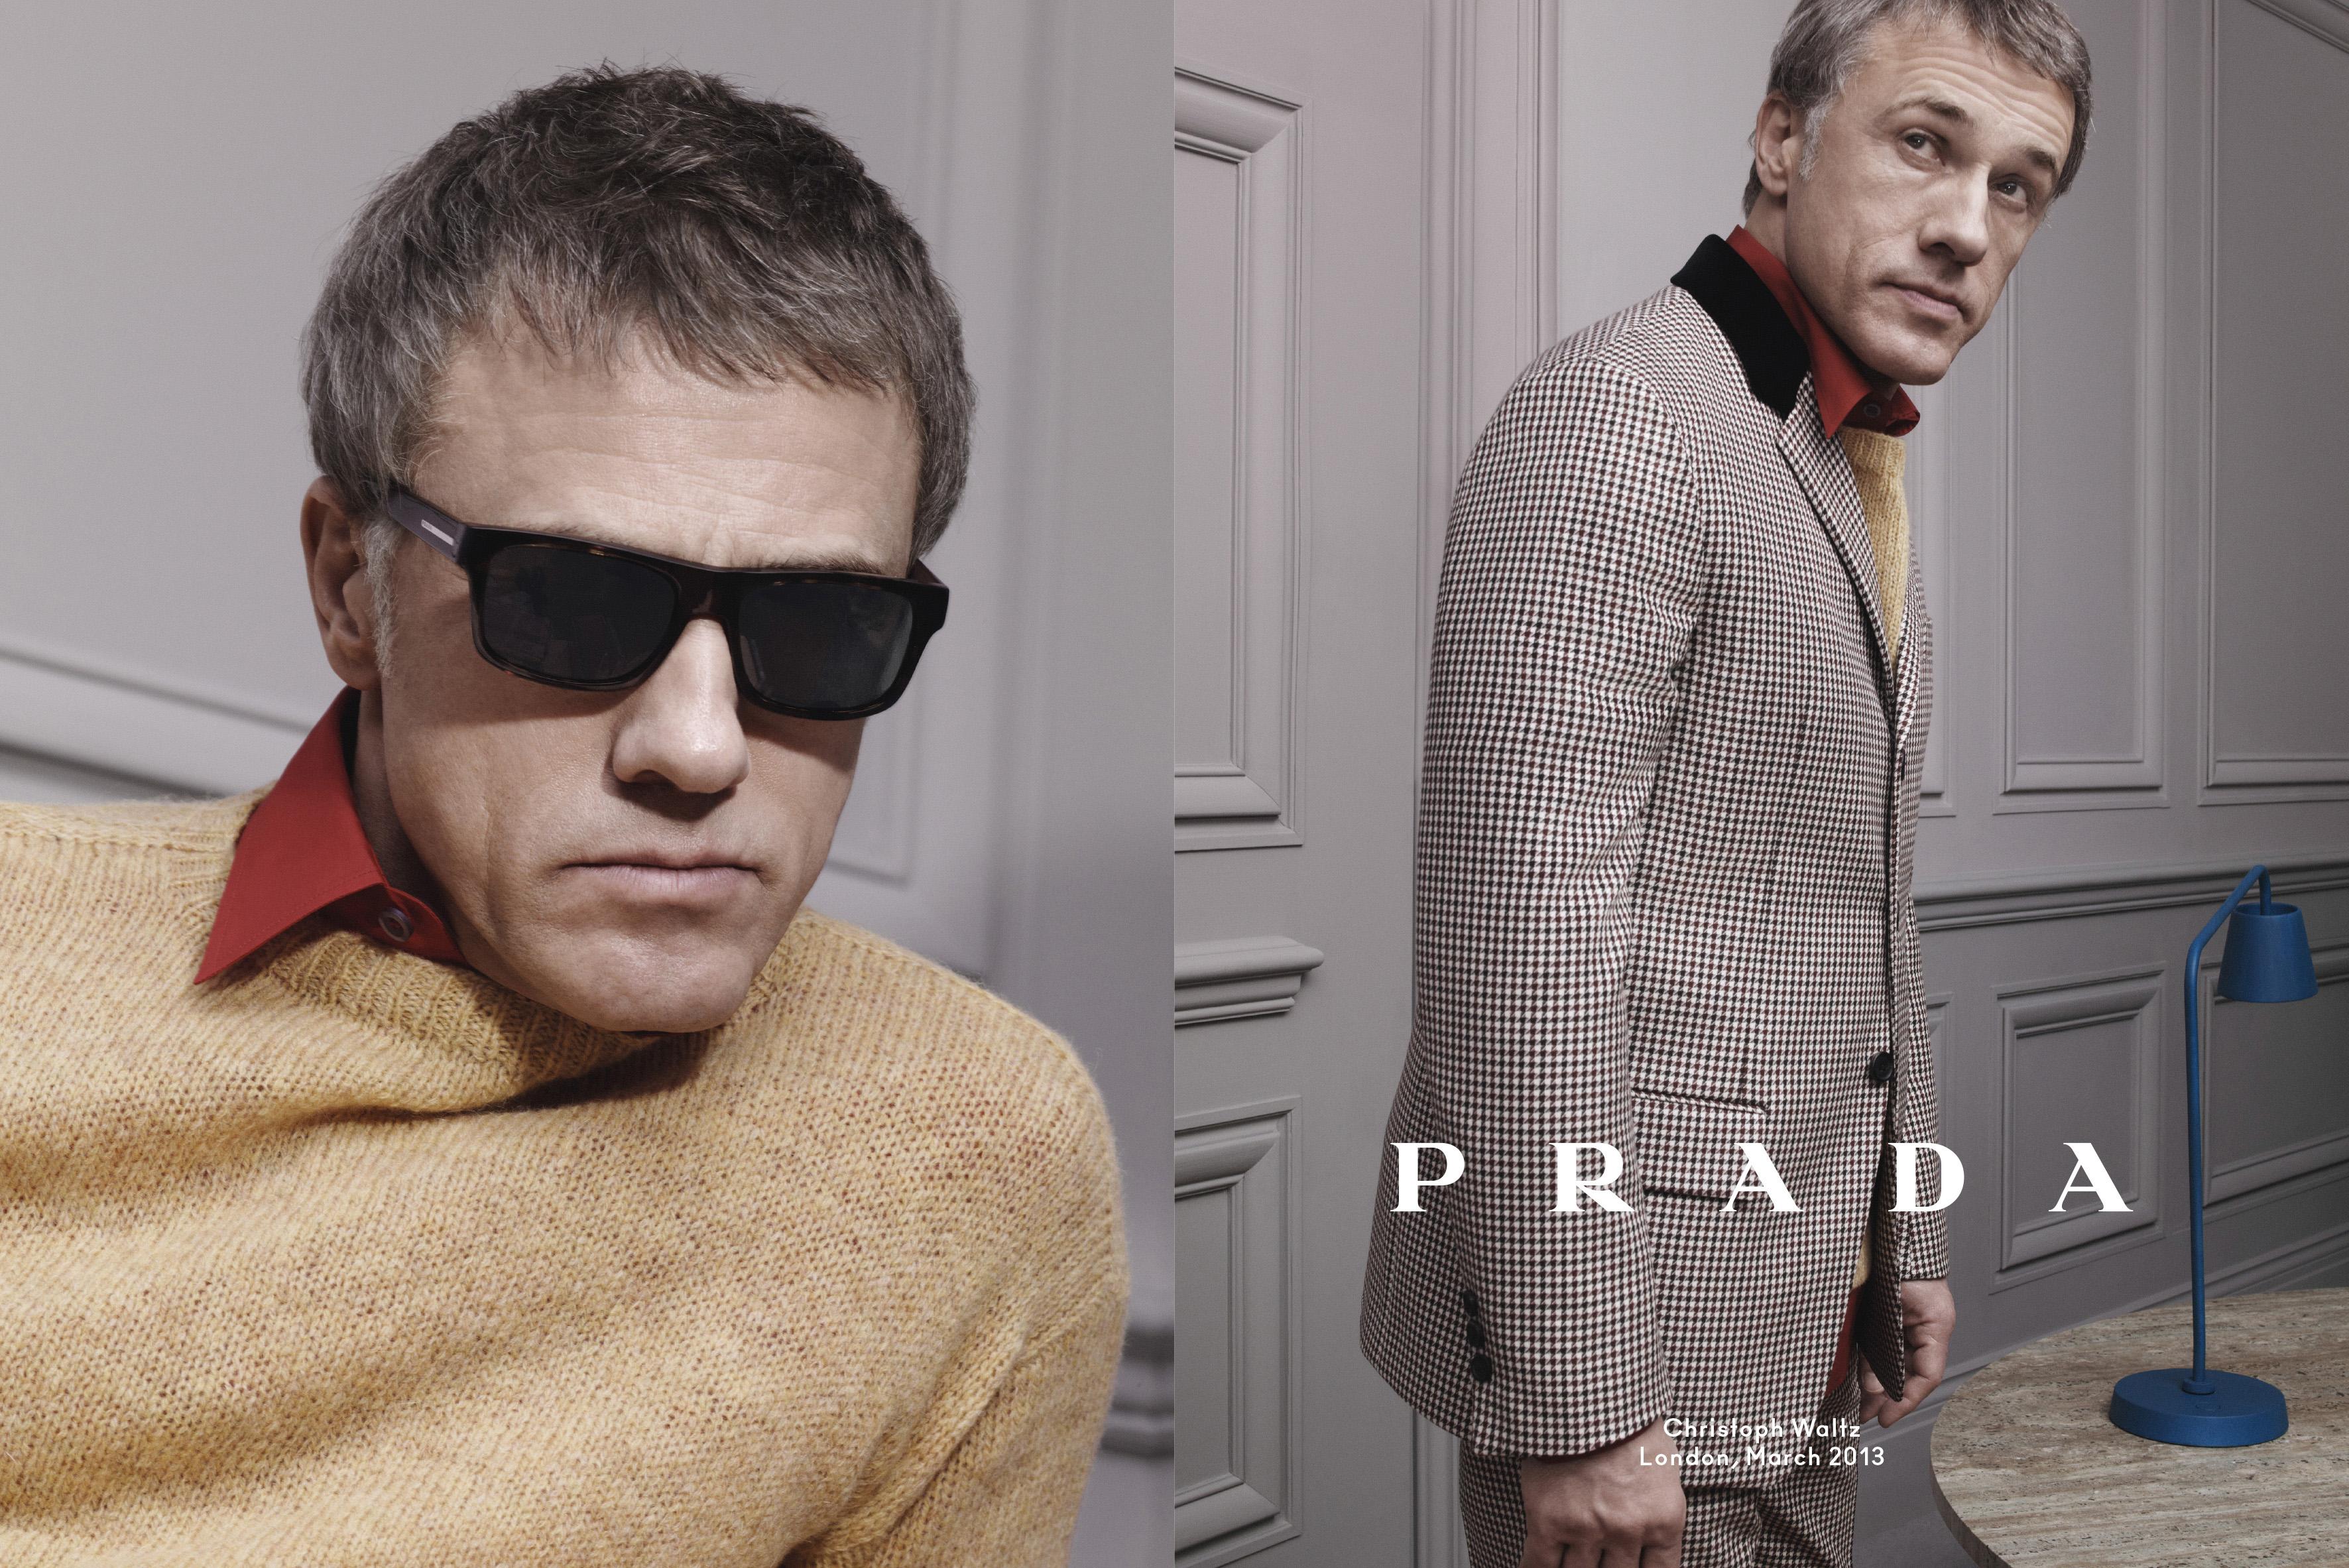 Prada_Menswear_FW13_Campaign_Christoph Waltz